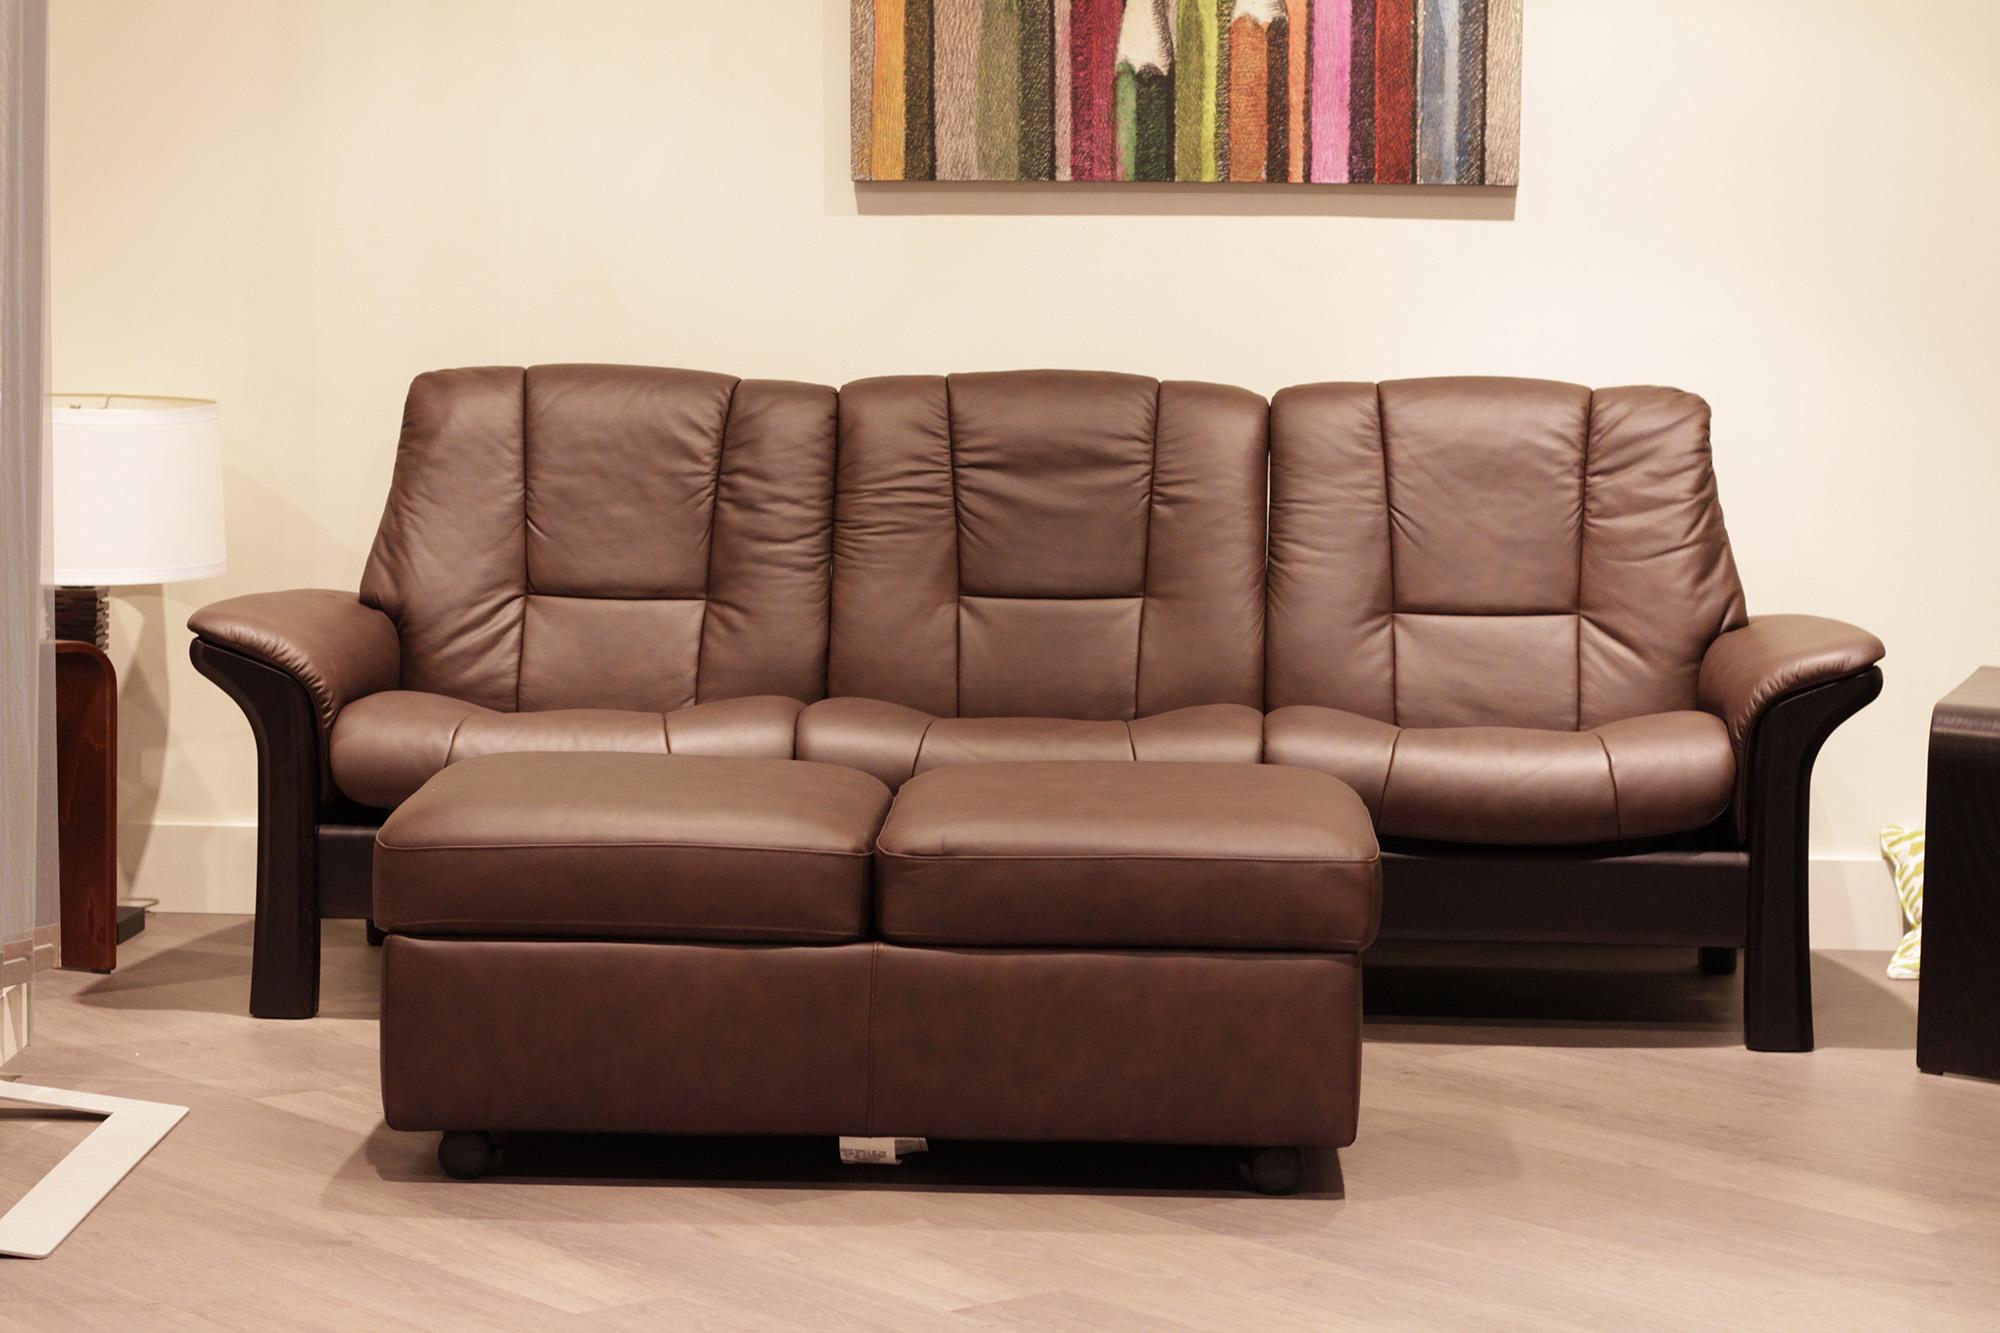 Stressless Buckingham 3 Seat Low Back Sofa Paloma Chocolate Leather